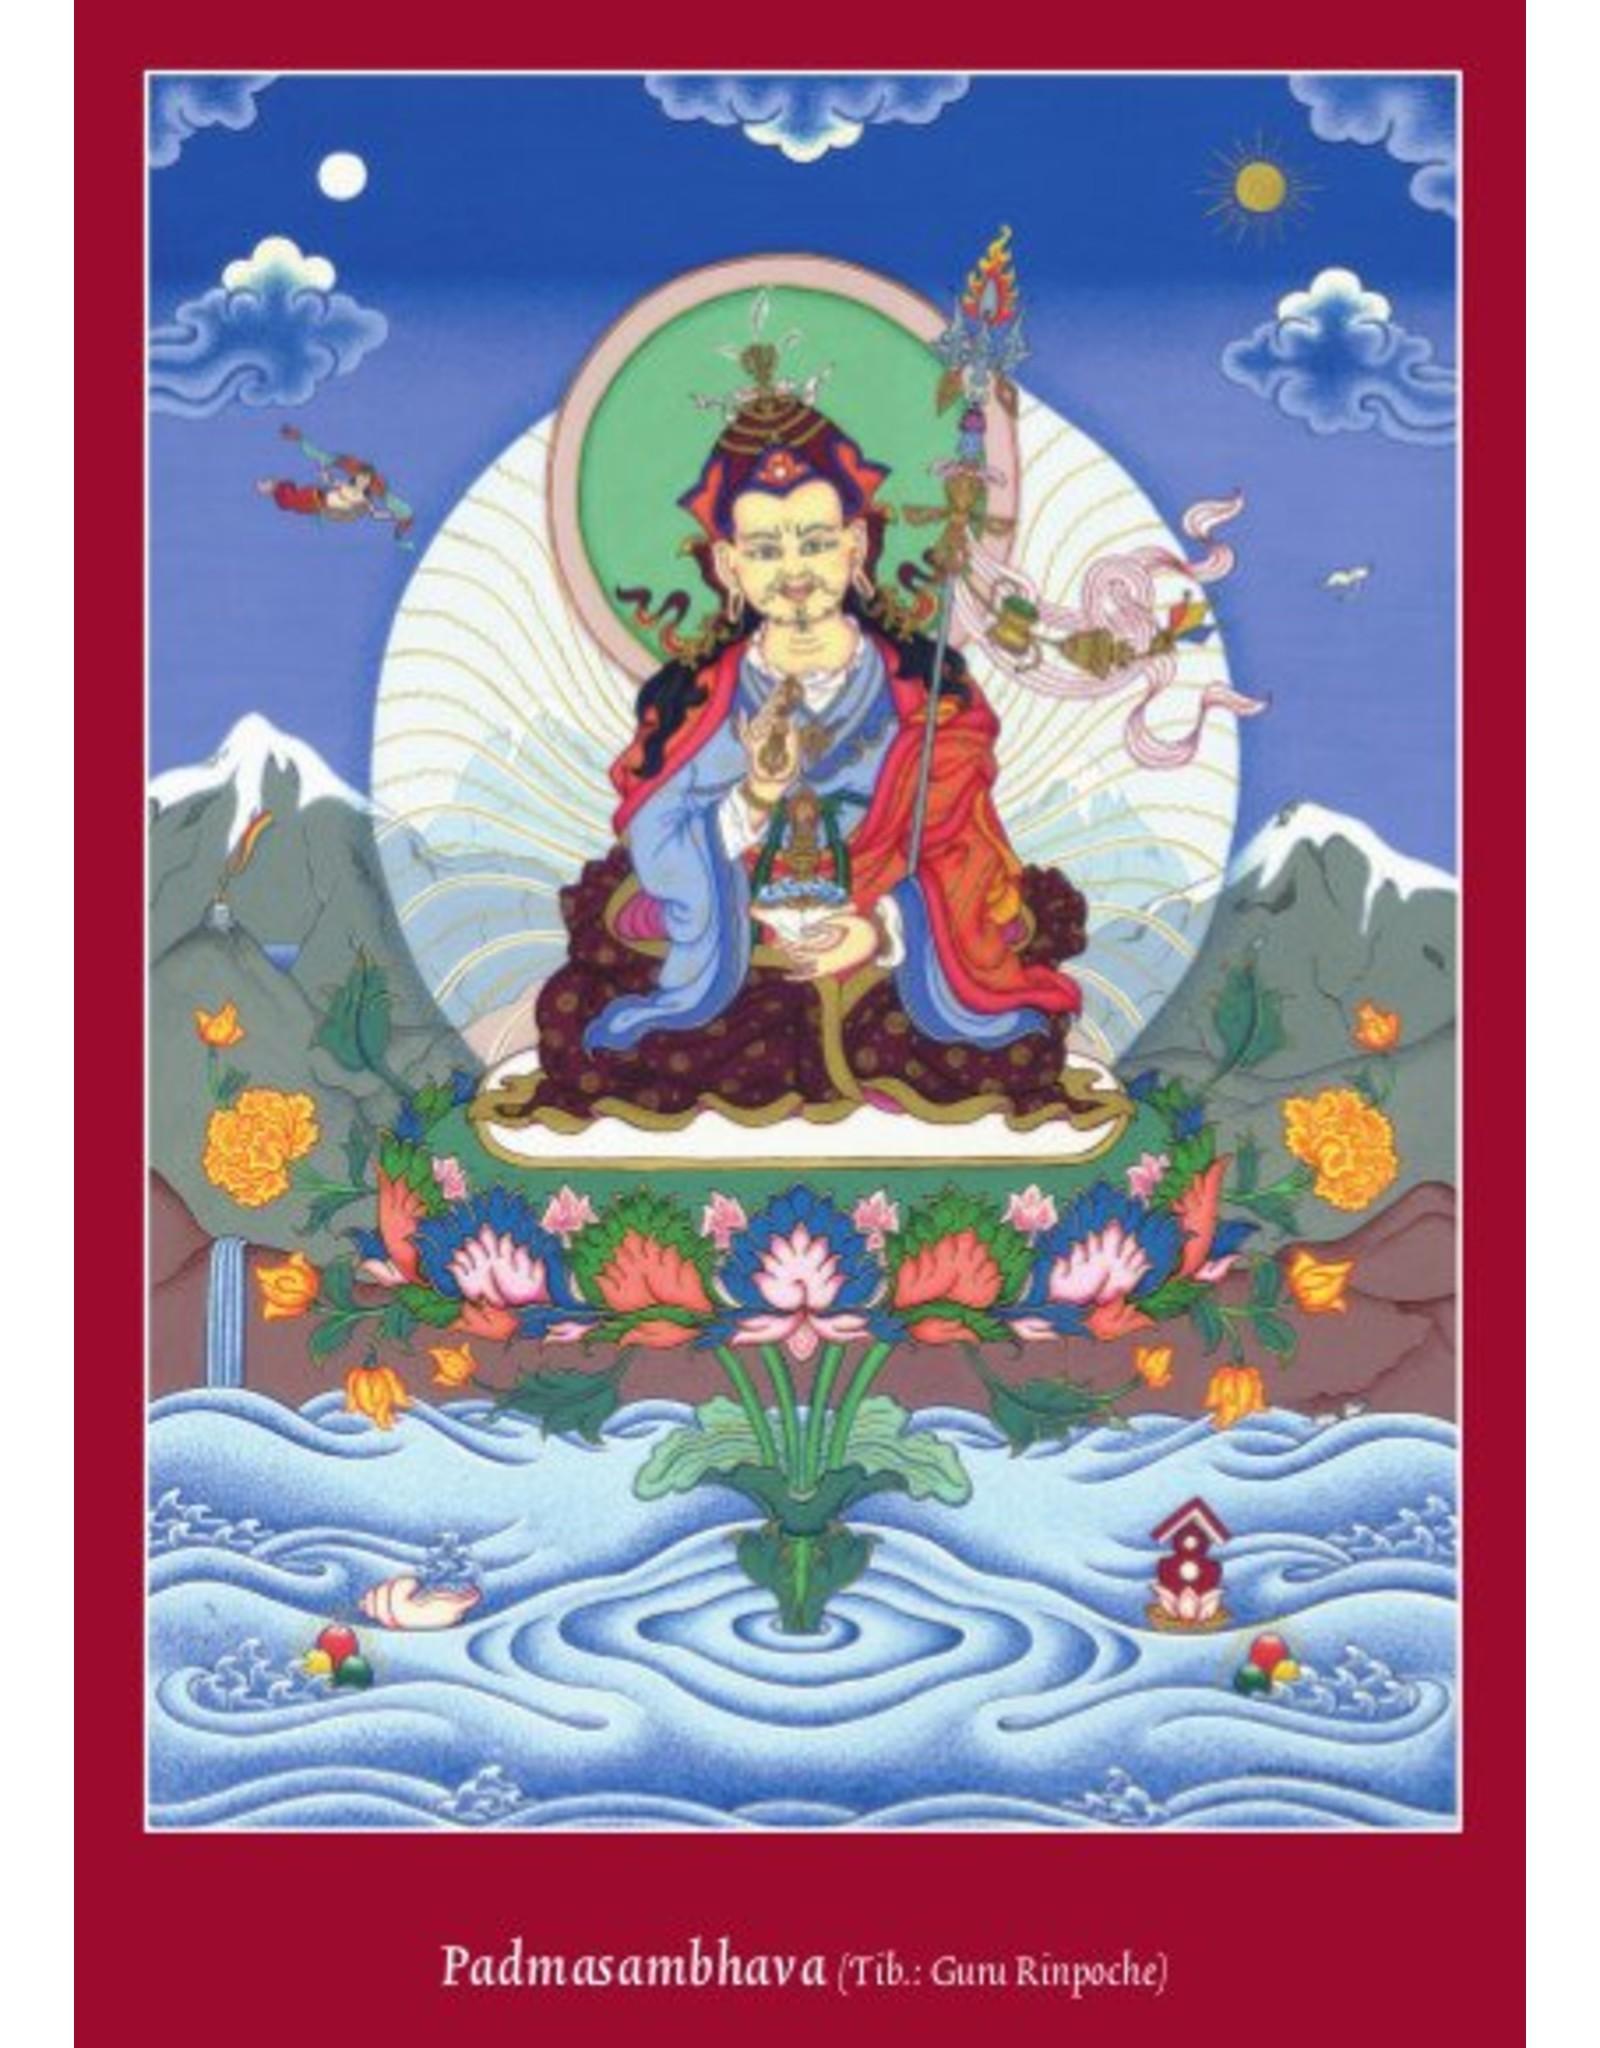 Tibetan Buddhist Art postcard Padmasambhava